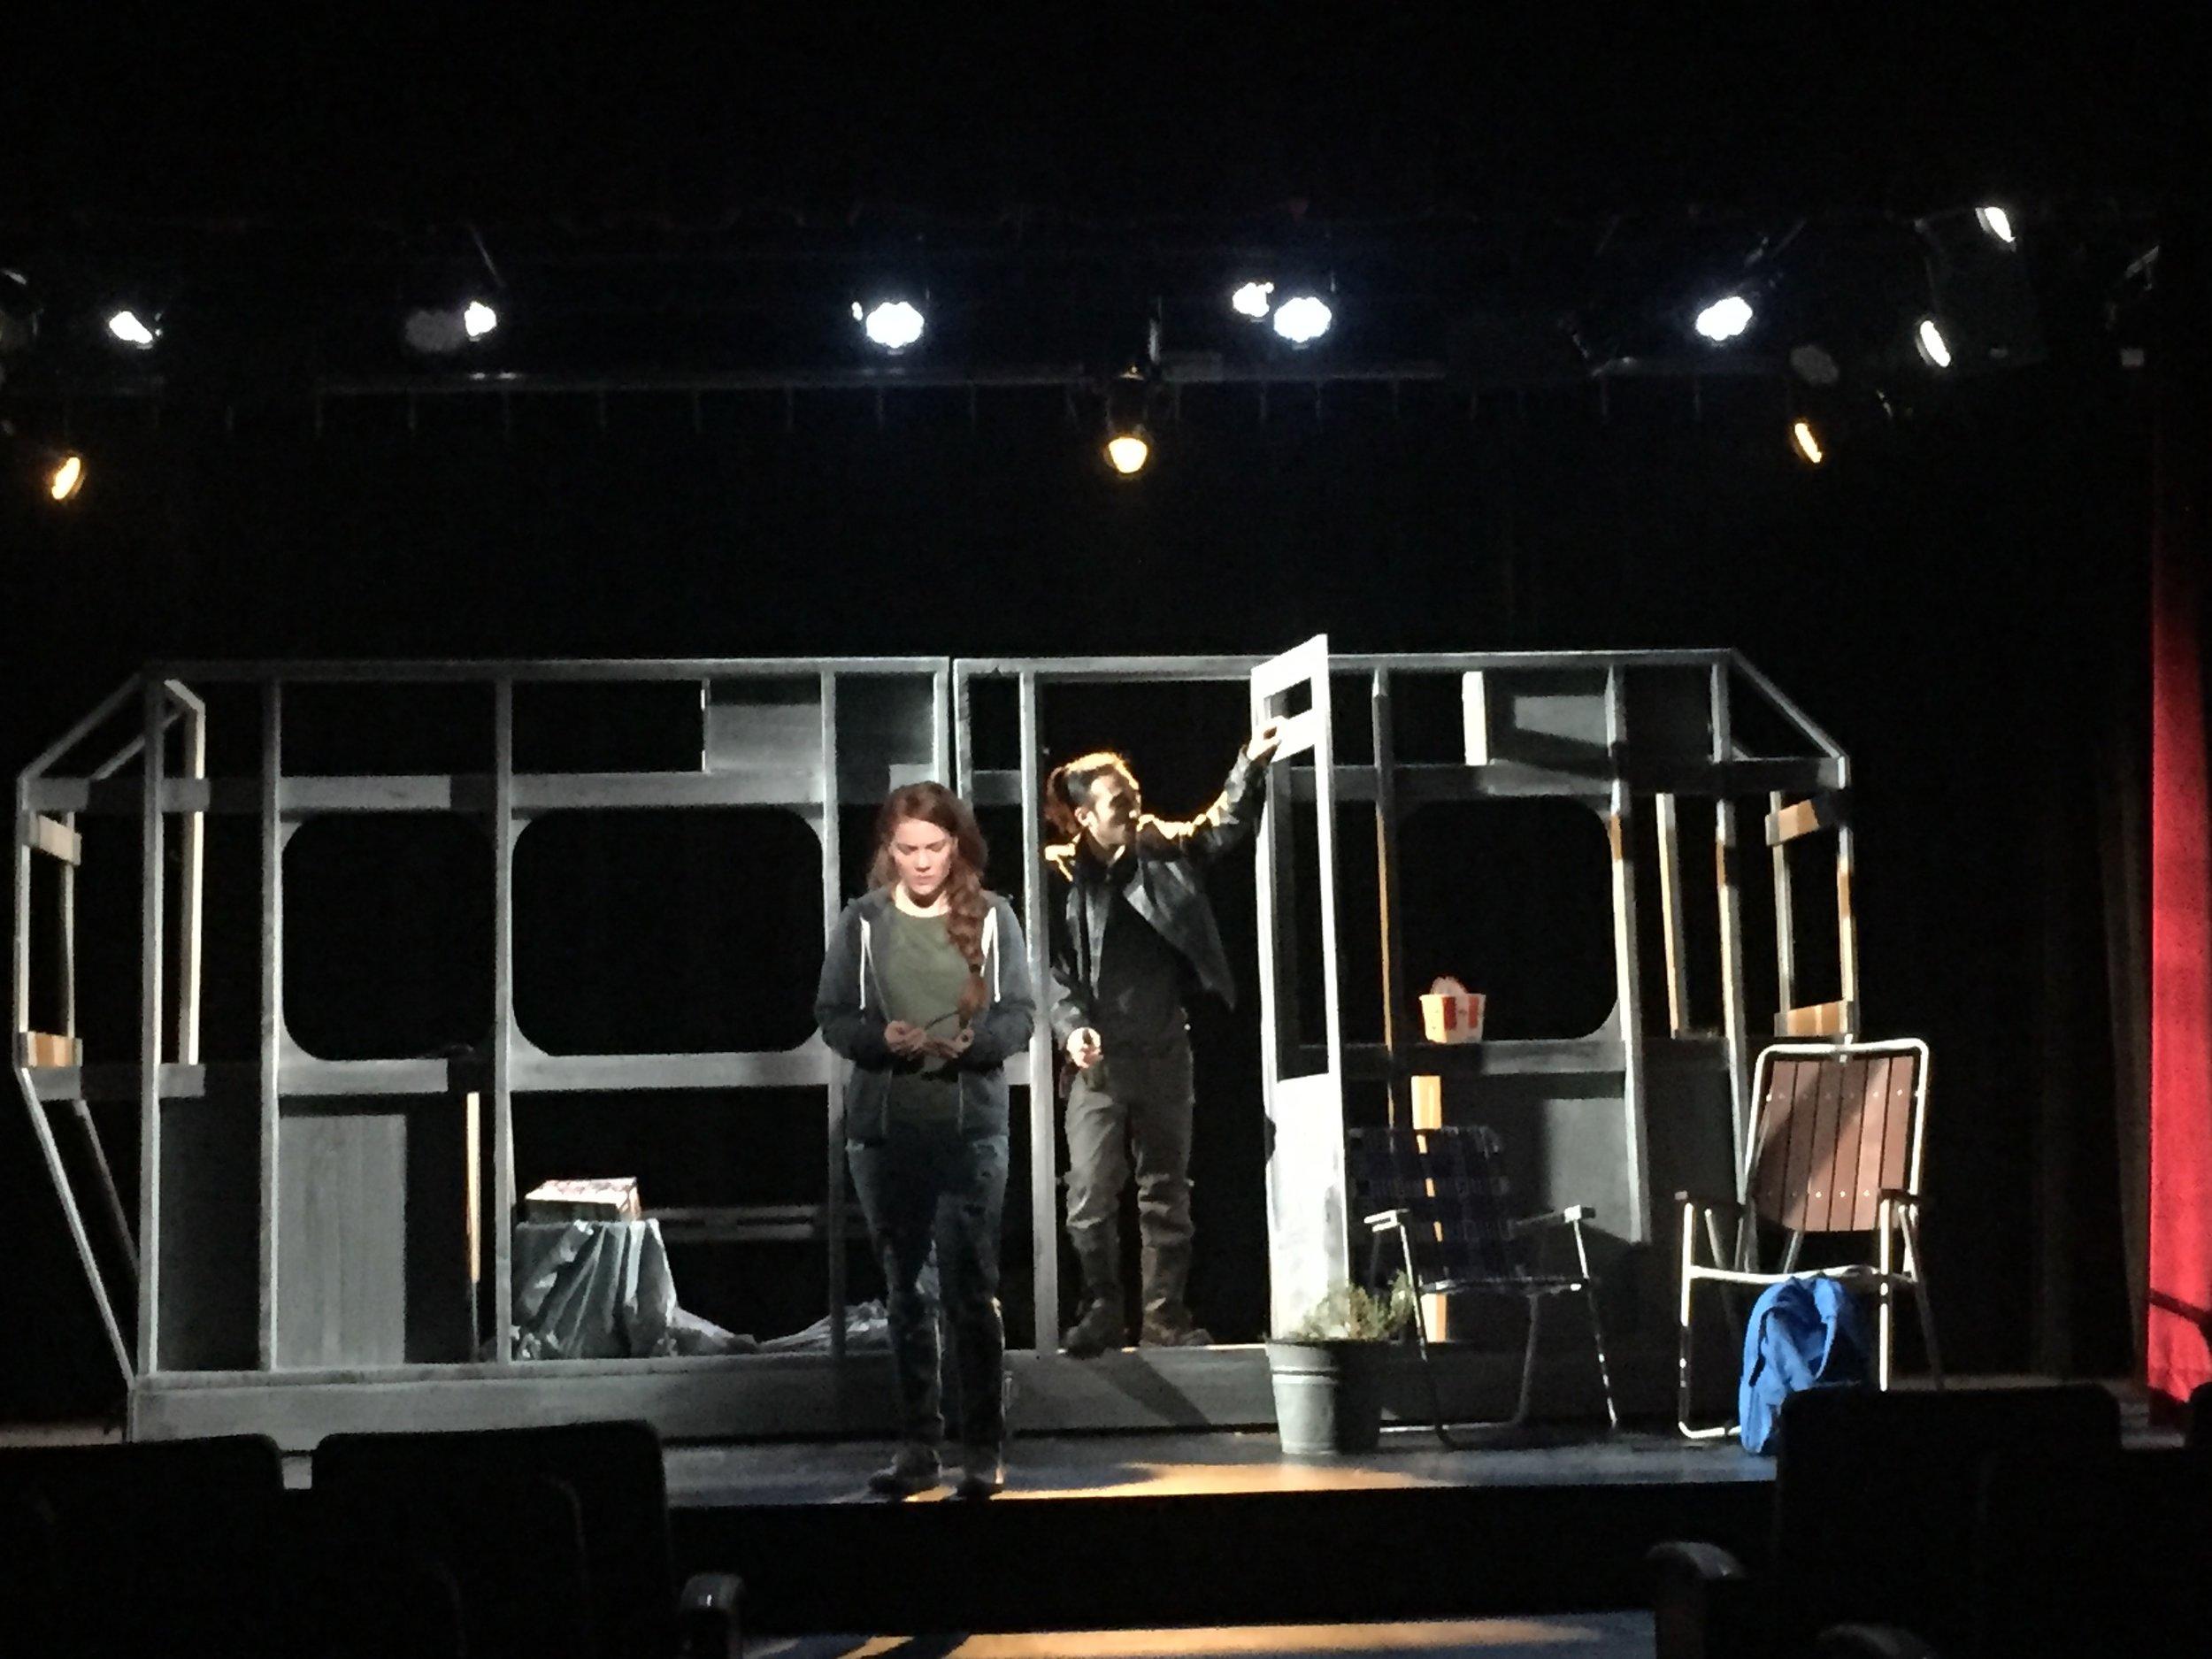 Jordan and Dwayne, New York Film Academy, 2016